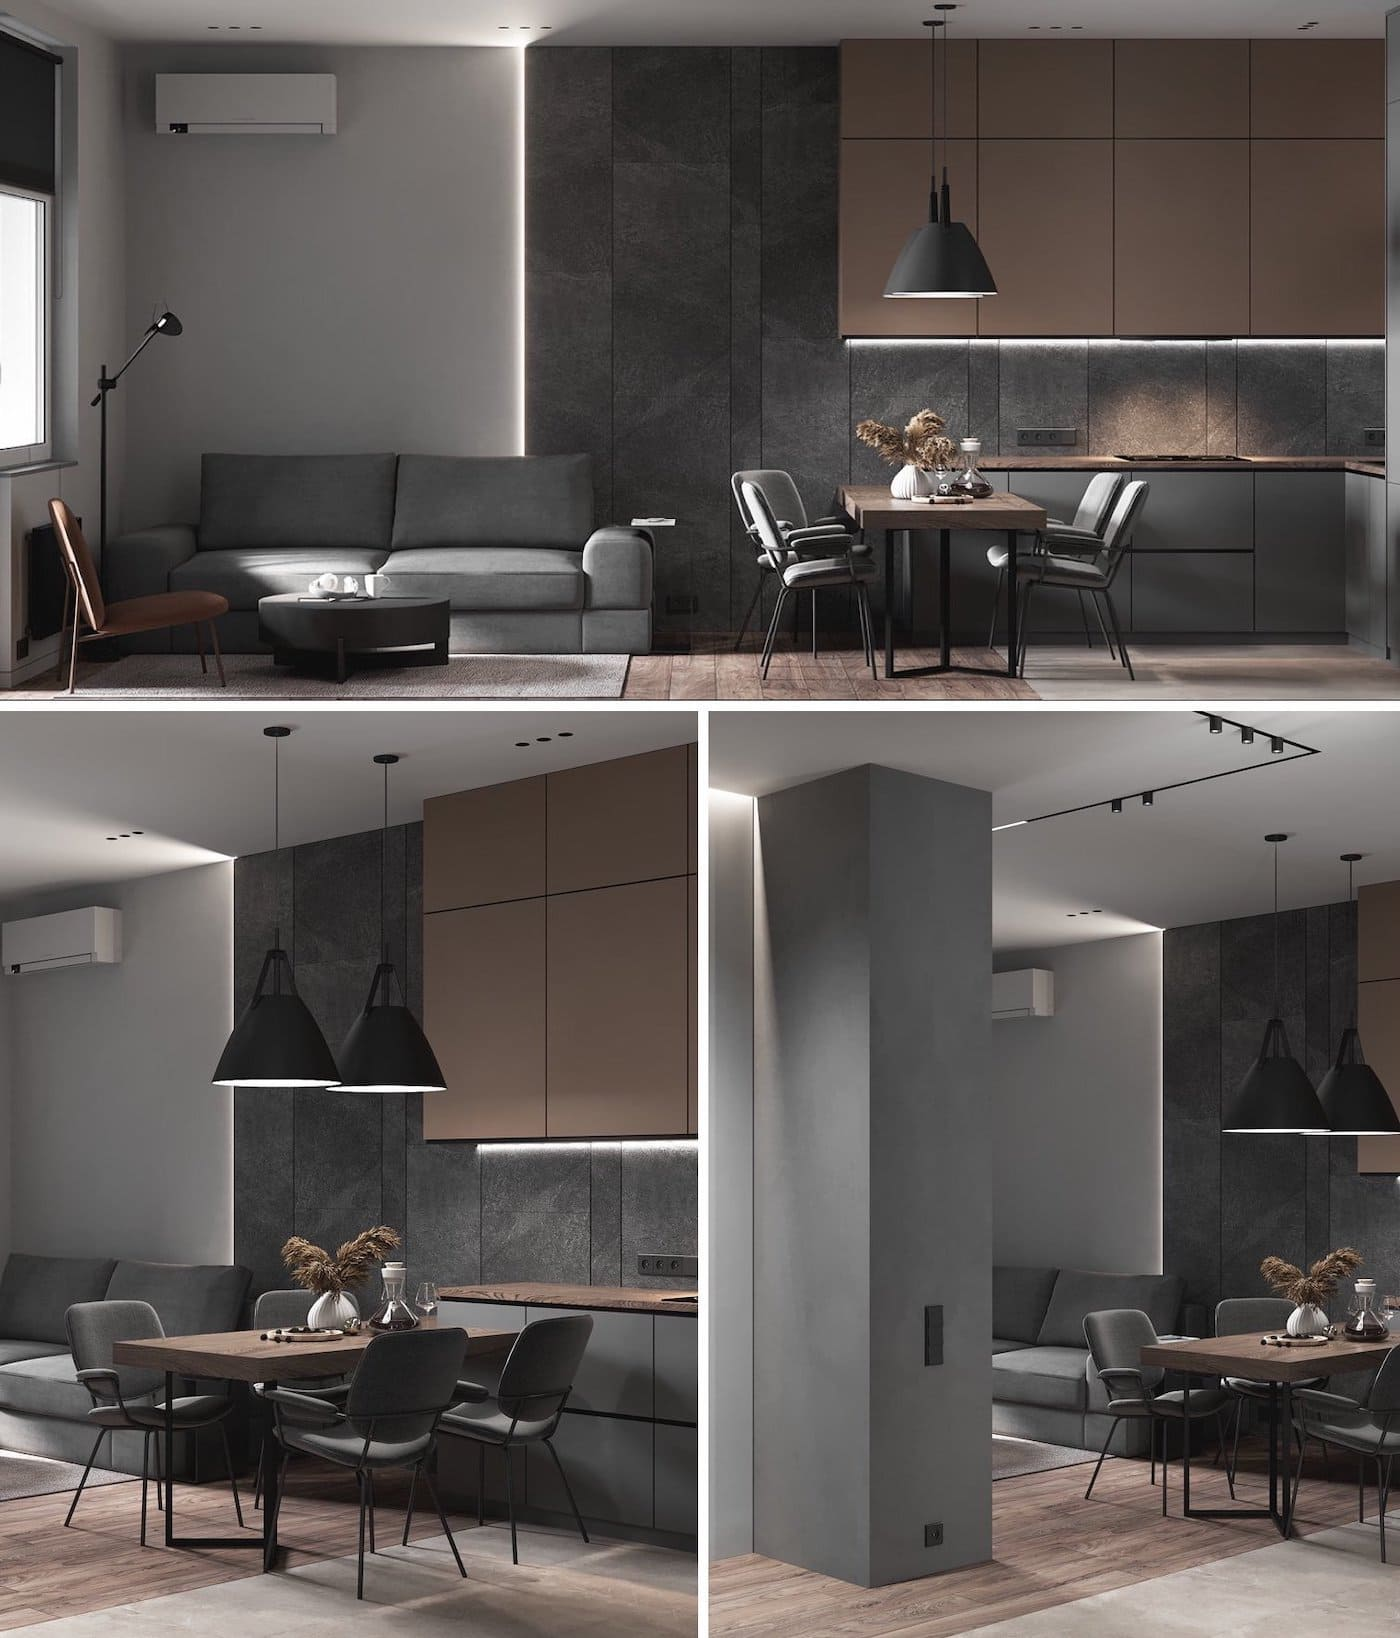 модный дизайн интерьера квартиры фото 5